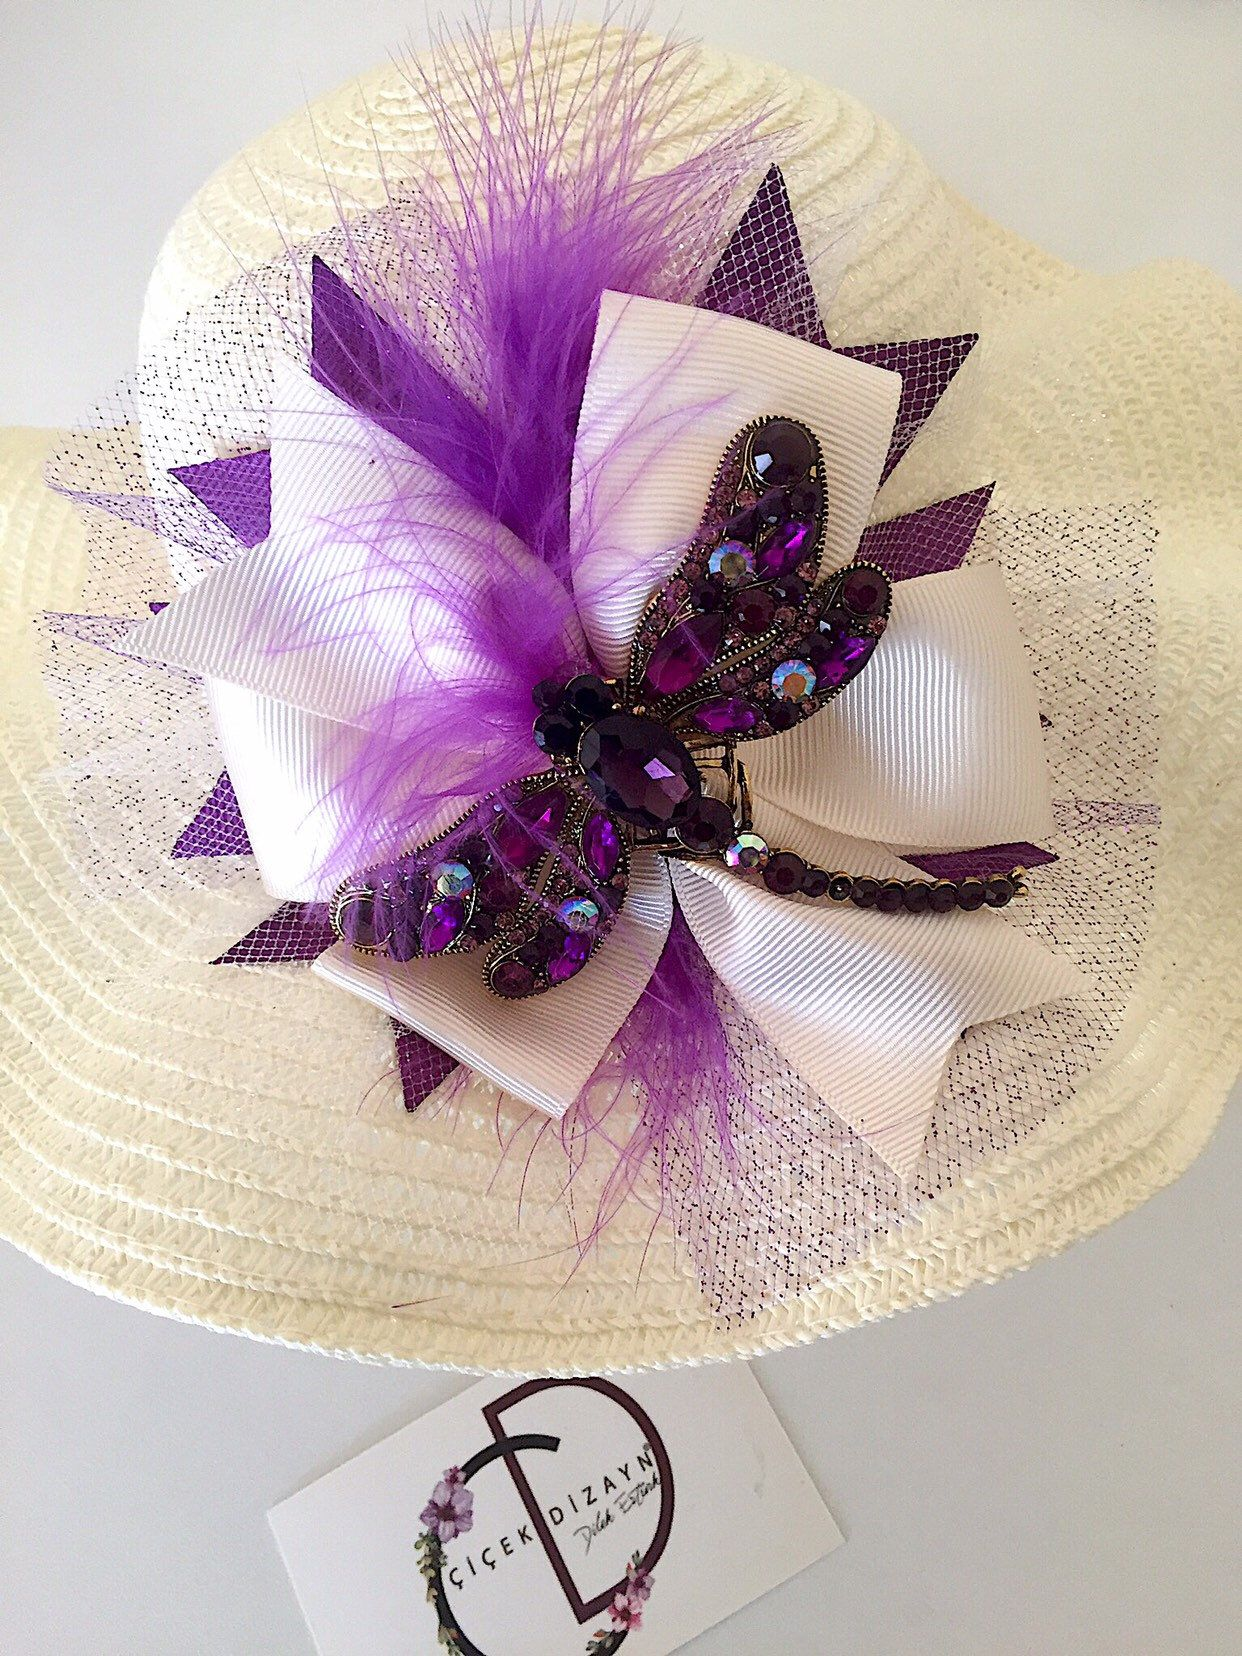 Photo of Ceeam Straw Hat Toddler, Sun Hat Baby Girl, Summer Cap Kids, Purple Dragonfly Hat Children, Birthday Gift, Photo Shoot Prop, Feather Fancy